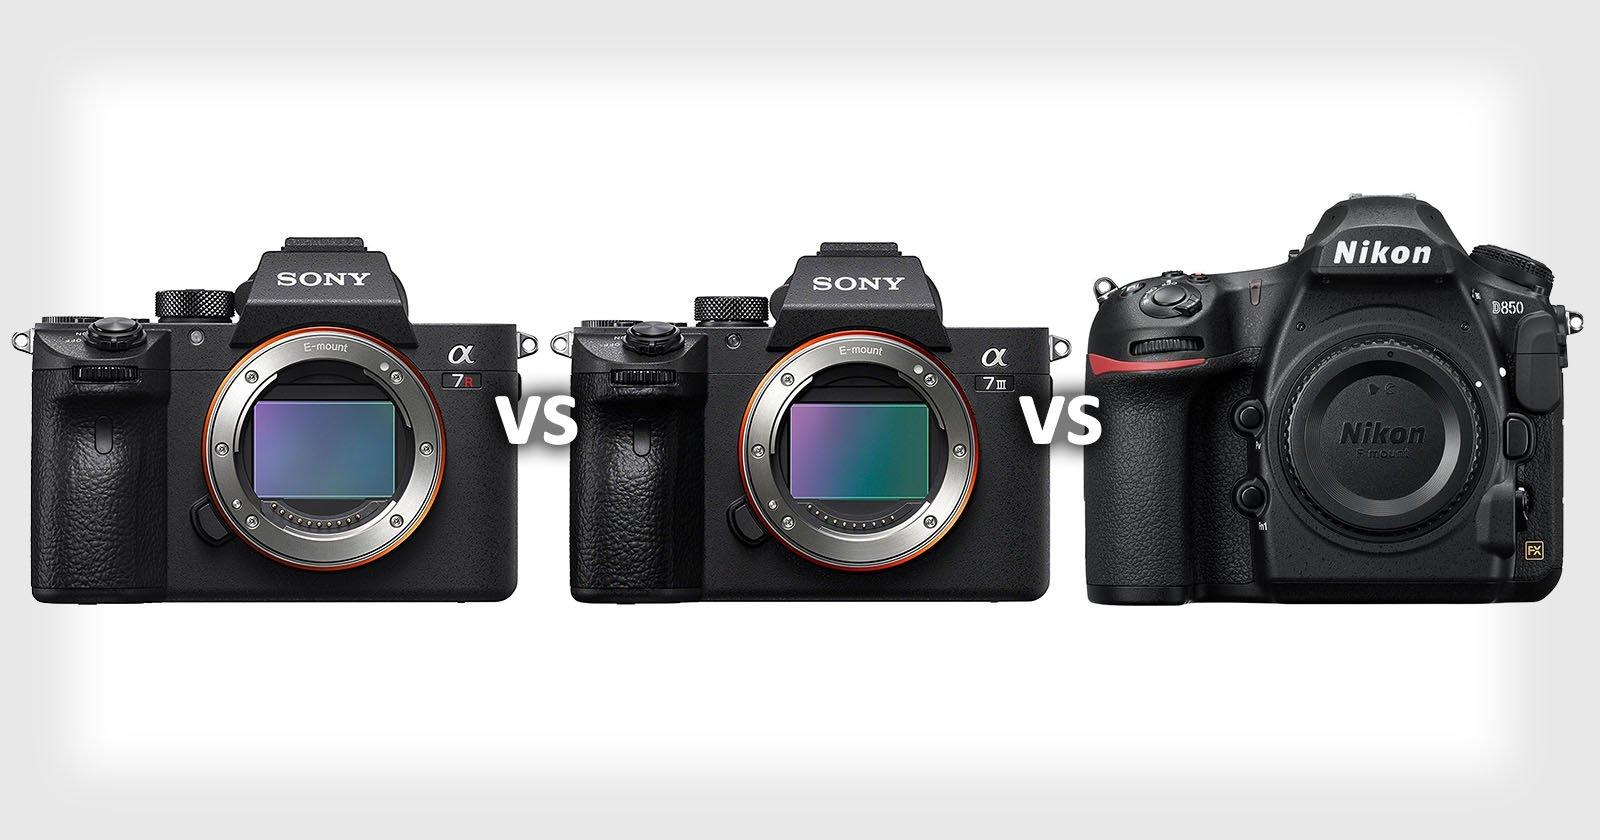 Shootout: Sony a7R III vs Sony a7 III vs Nikon D850